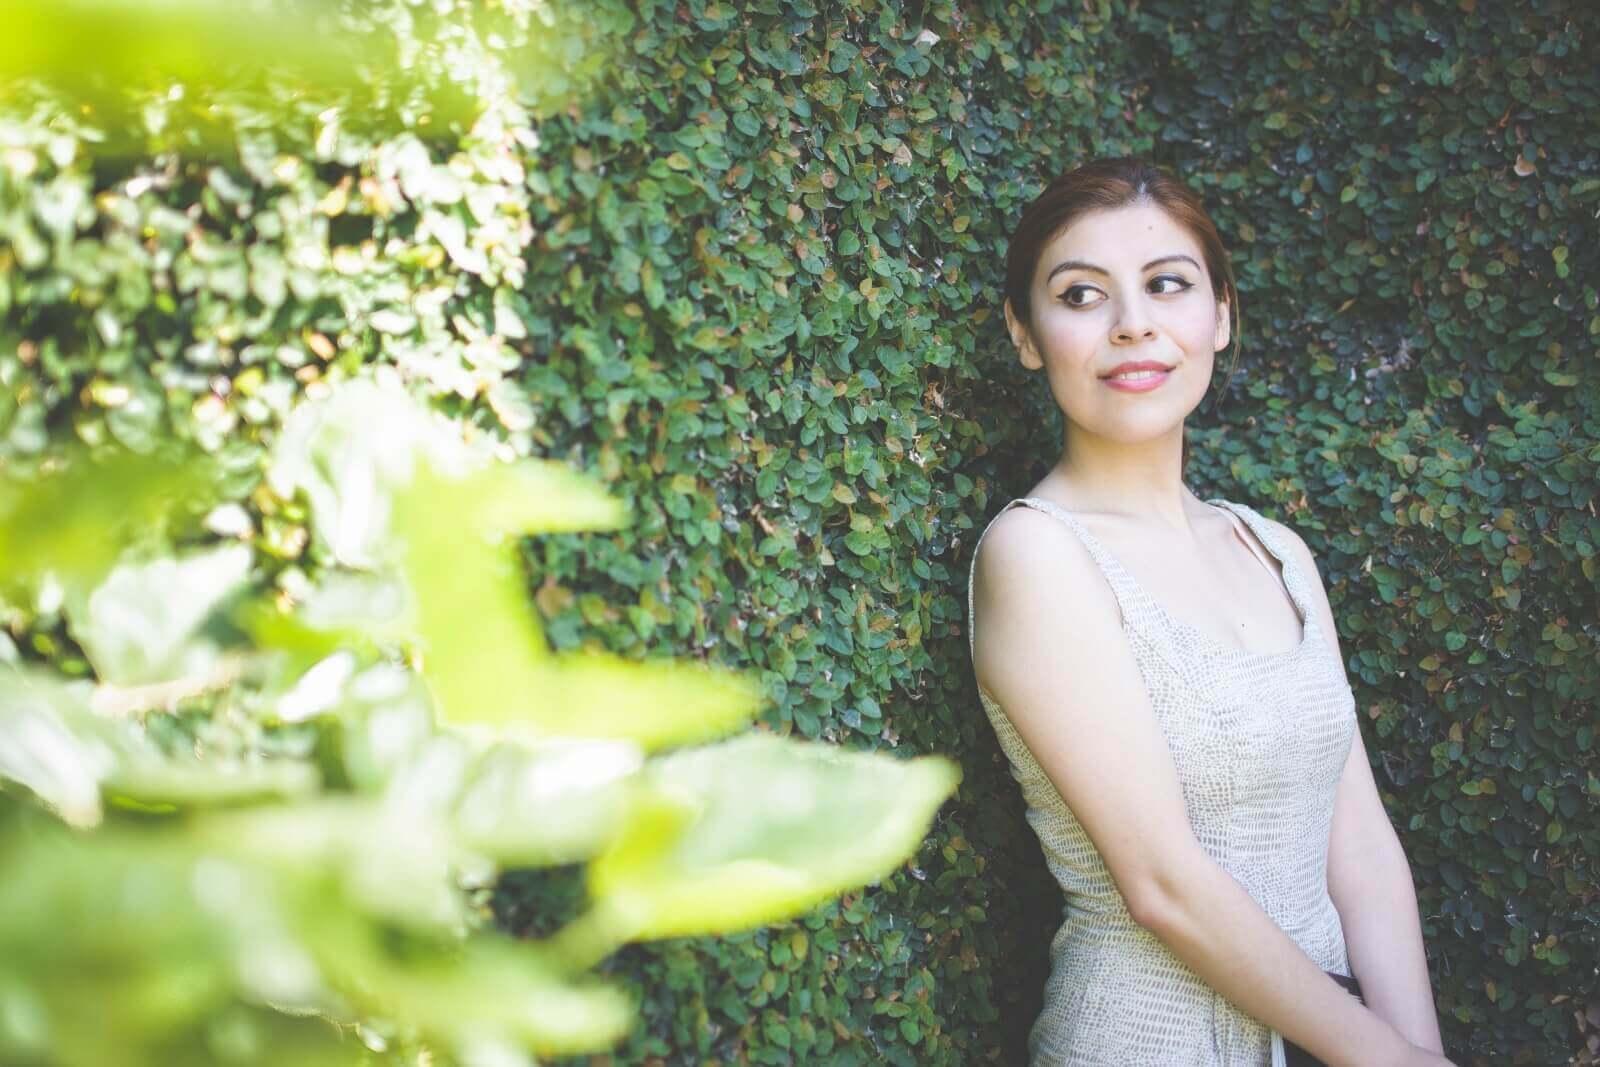 almond-white-dress-sammydress-stilettos-valentino-rockstud-imitation-deborah-ferrero-style-by-deb-ladylike16